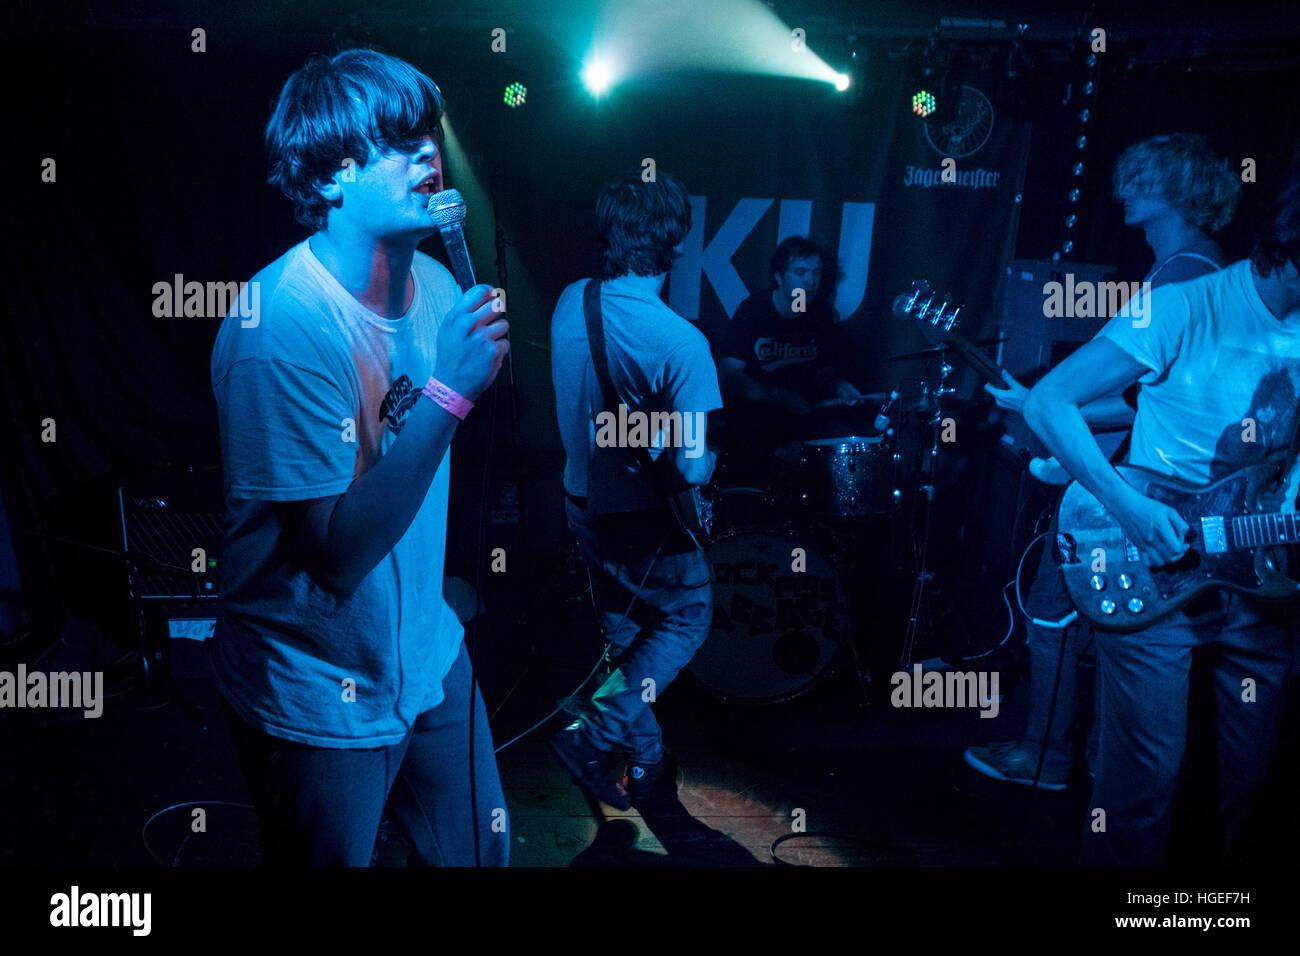 The band Cabbage play Ku Bar in Stockton in November 2016 - Stock Image